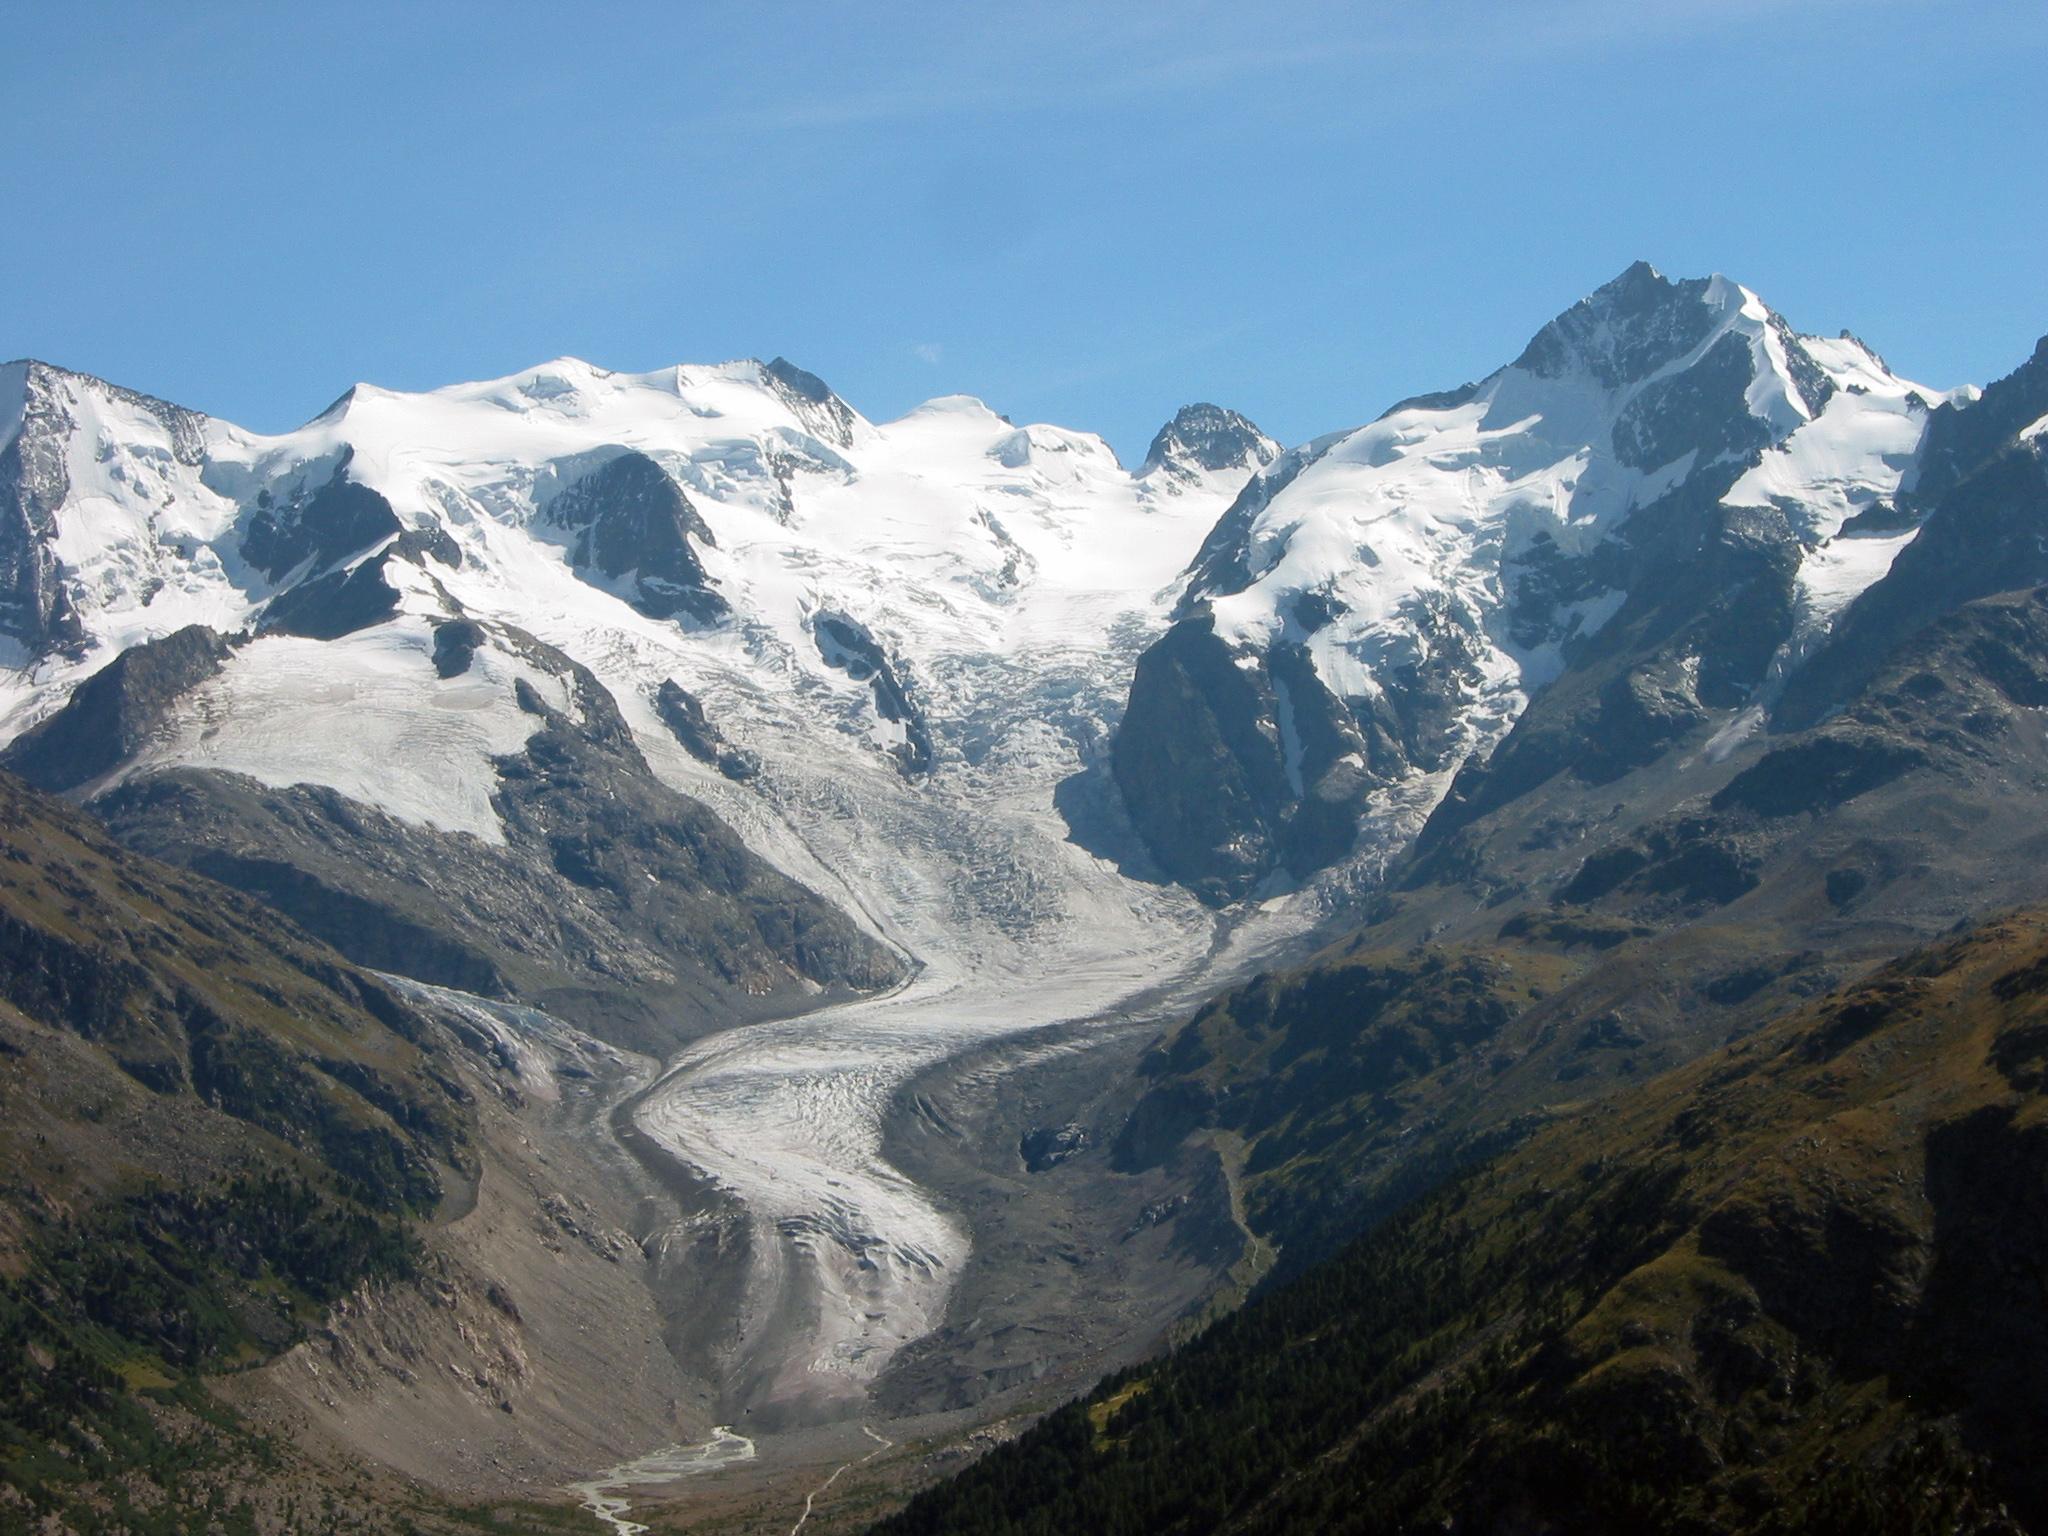 Morteratsch-Gletscher schmilzt: Klimaerwärmung steigert temporär Stromproduktion und senkt Verbrauch.